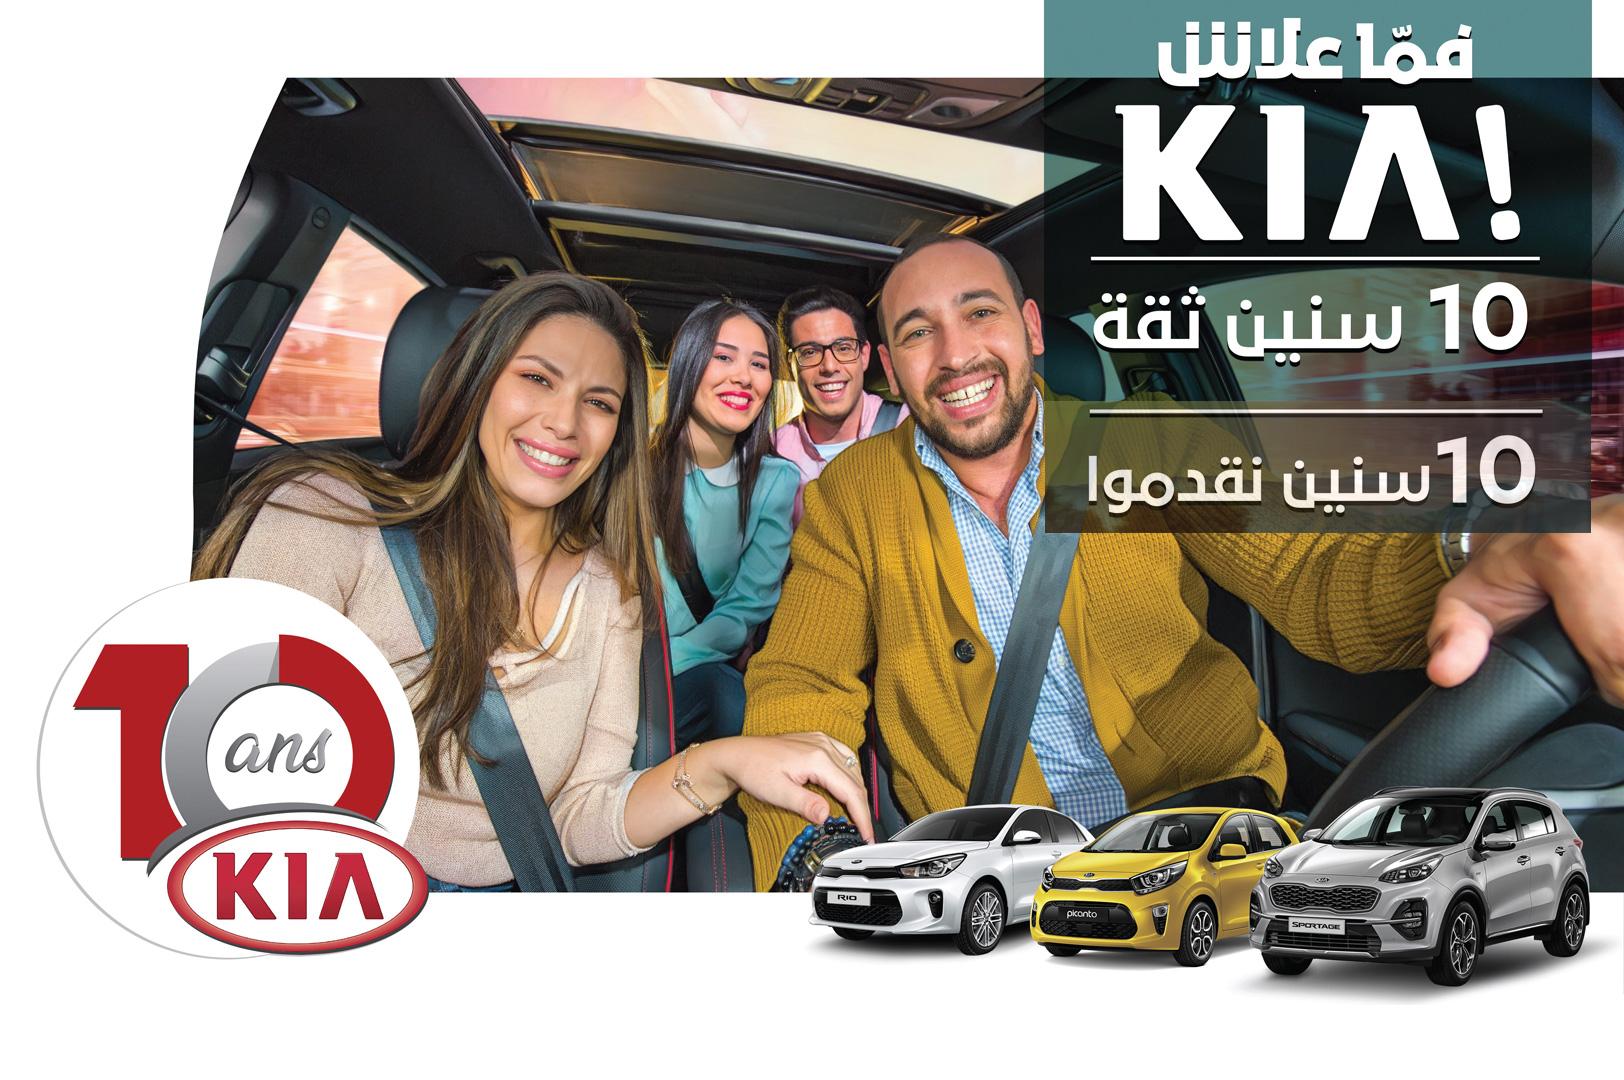 City Cars - KIA fête ses dix ans